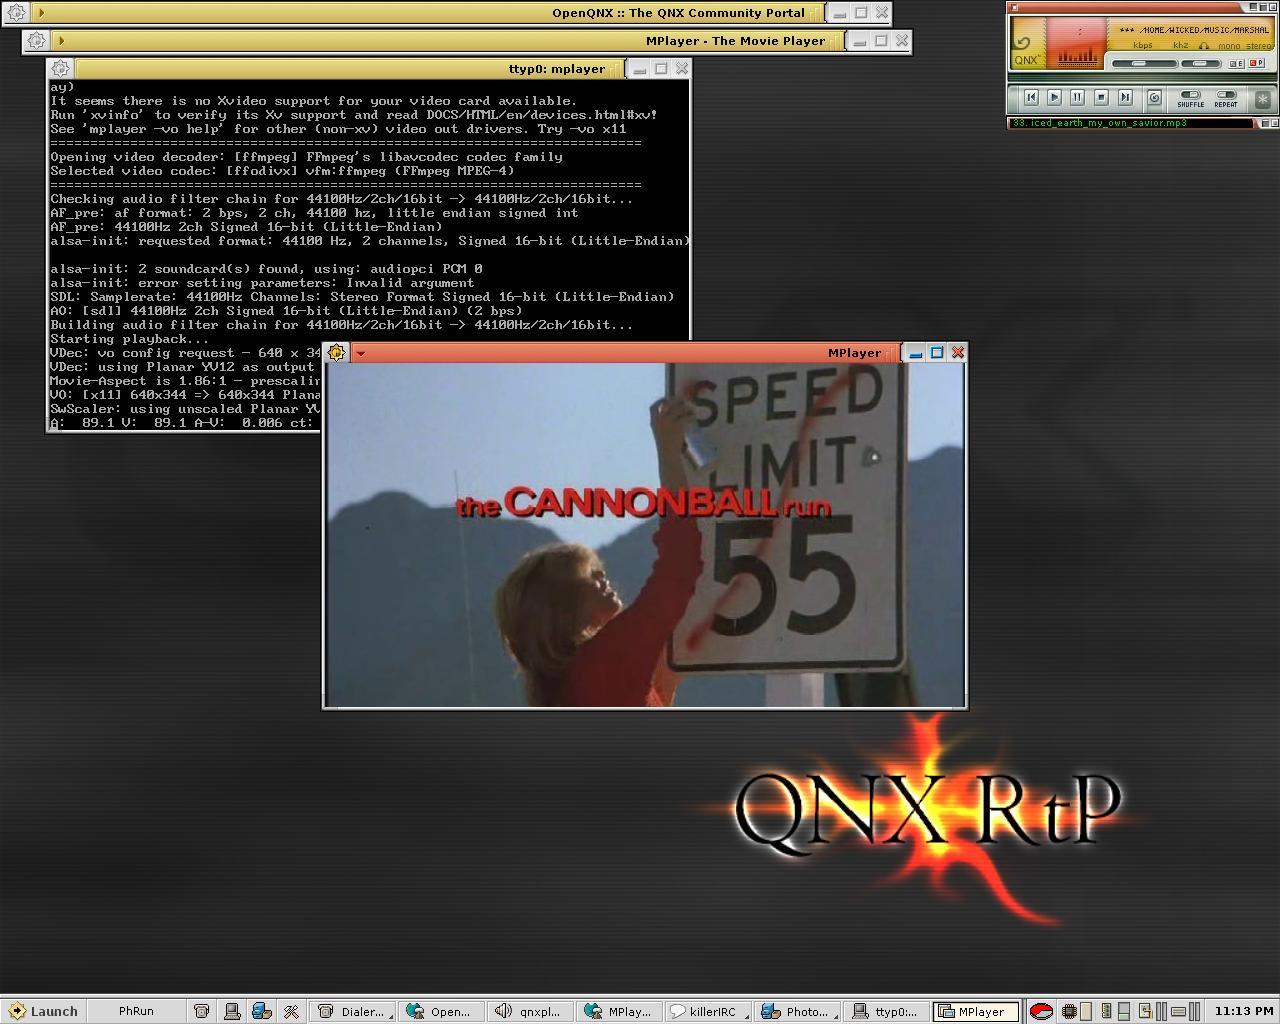 Movie javascript blocker interfering program